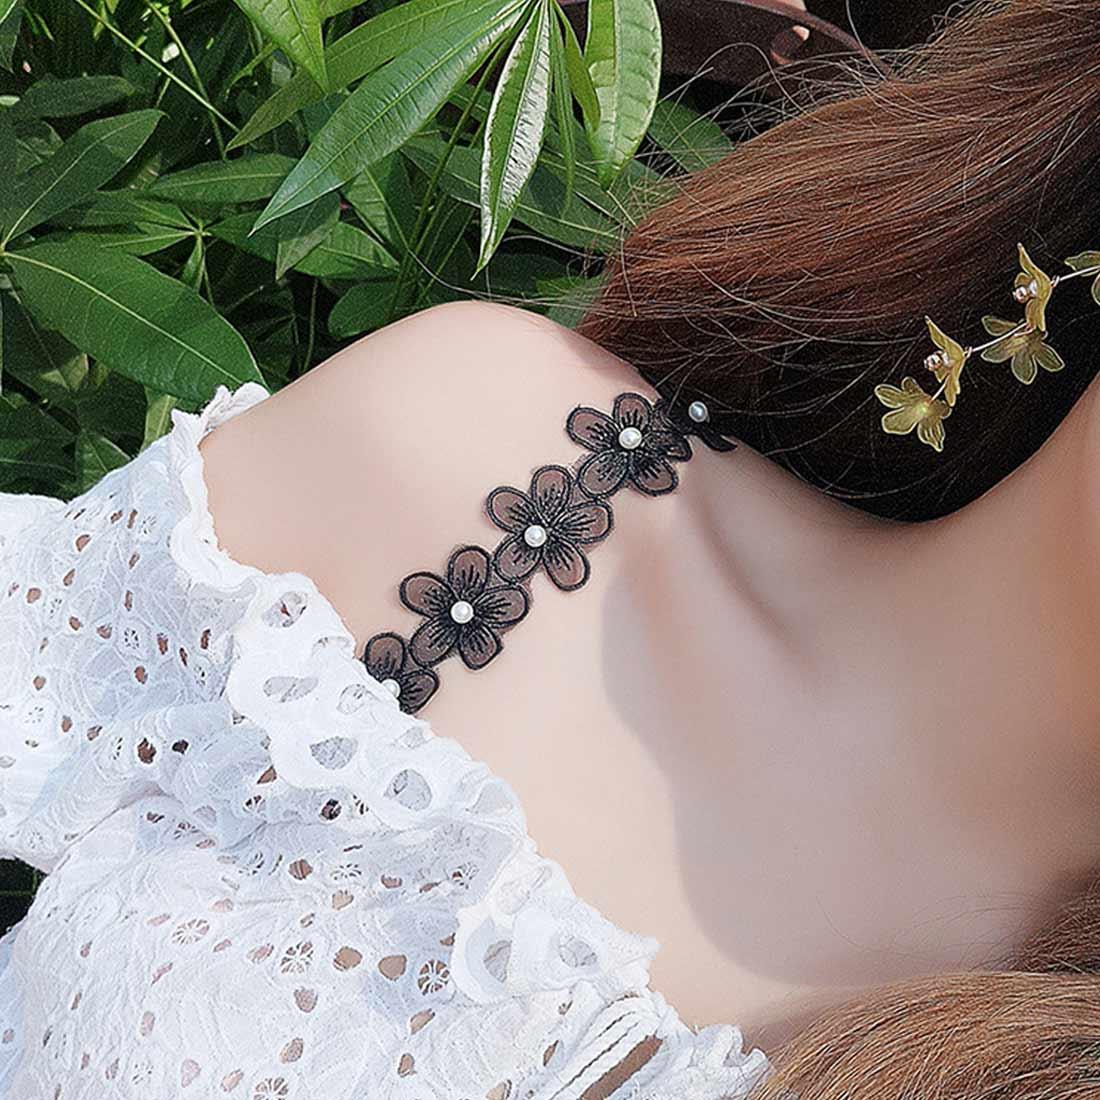 Decorative Cute Big Flower Pearl Lace Bra Straps Replacement Underwear Belt Women Intimate Bra Accessories Shoulder Straps